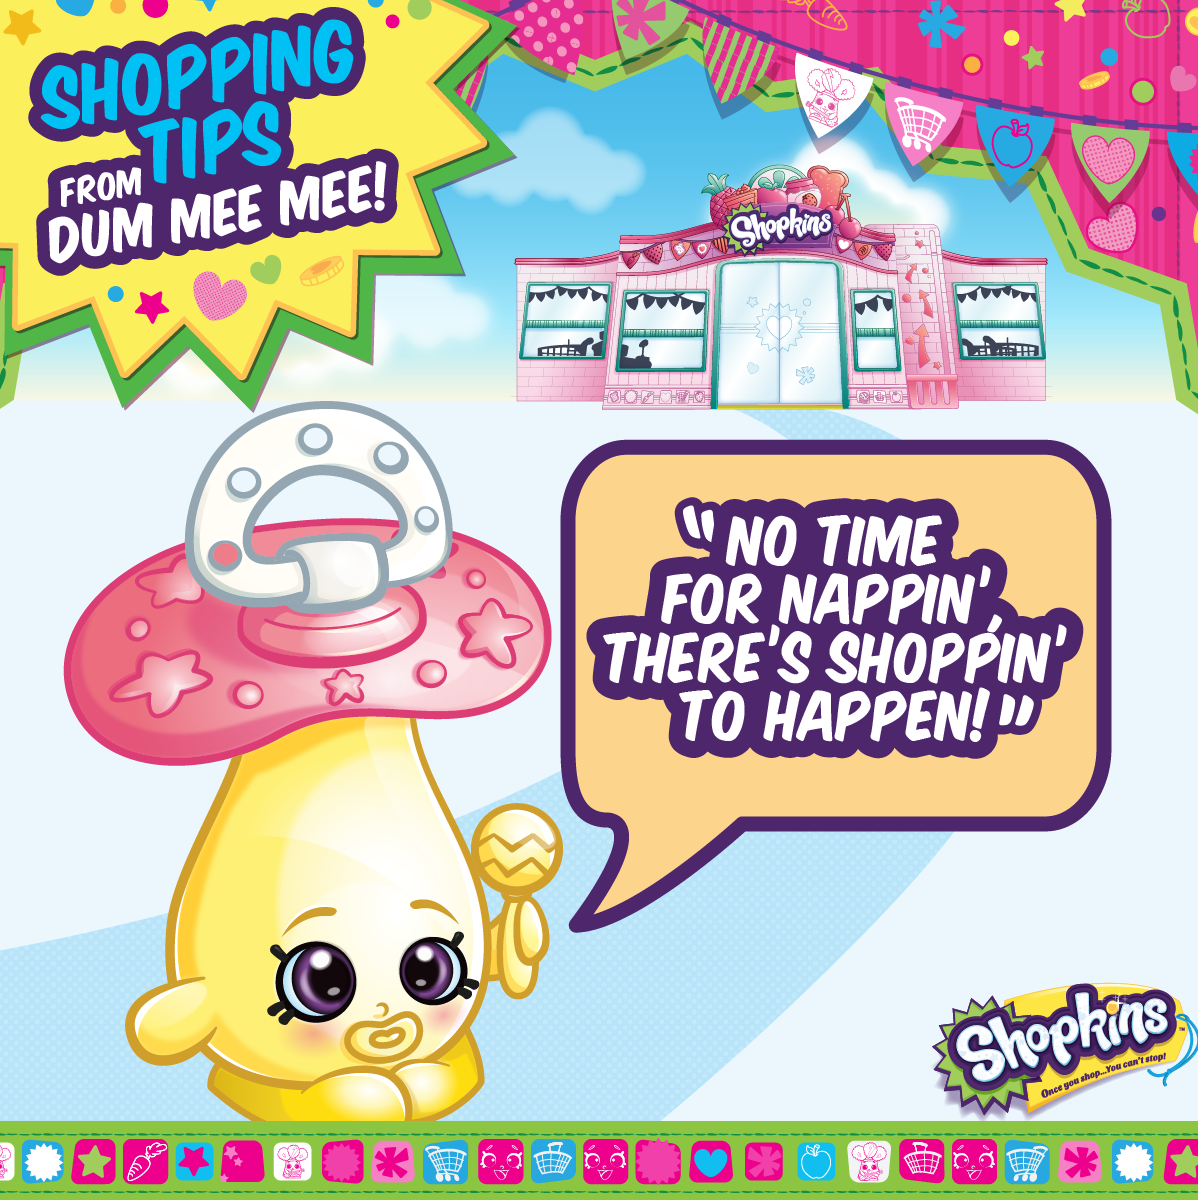 Dum Mee Mee Wants To Get Shoppin